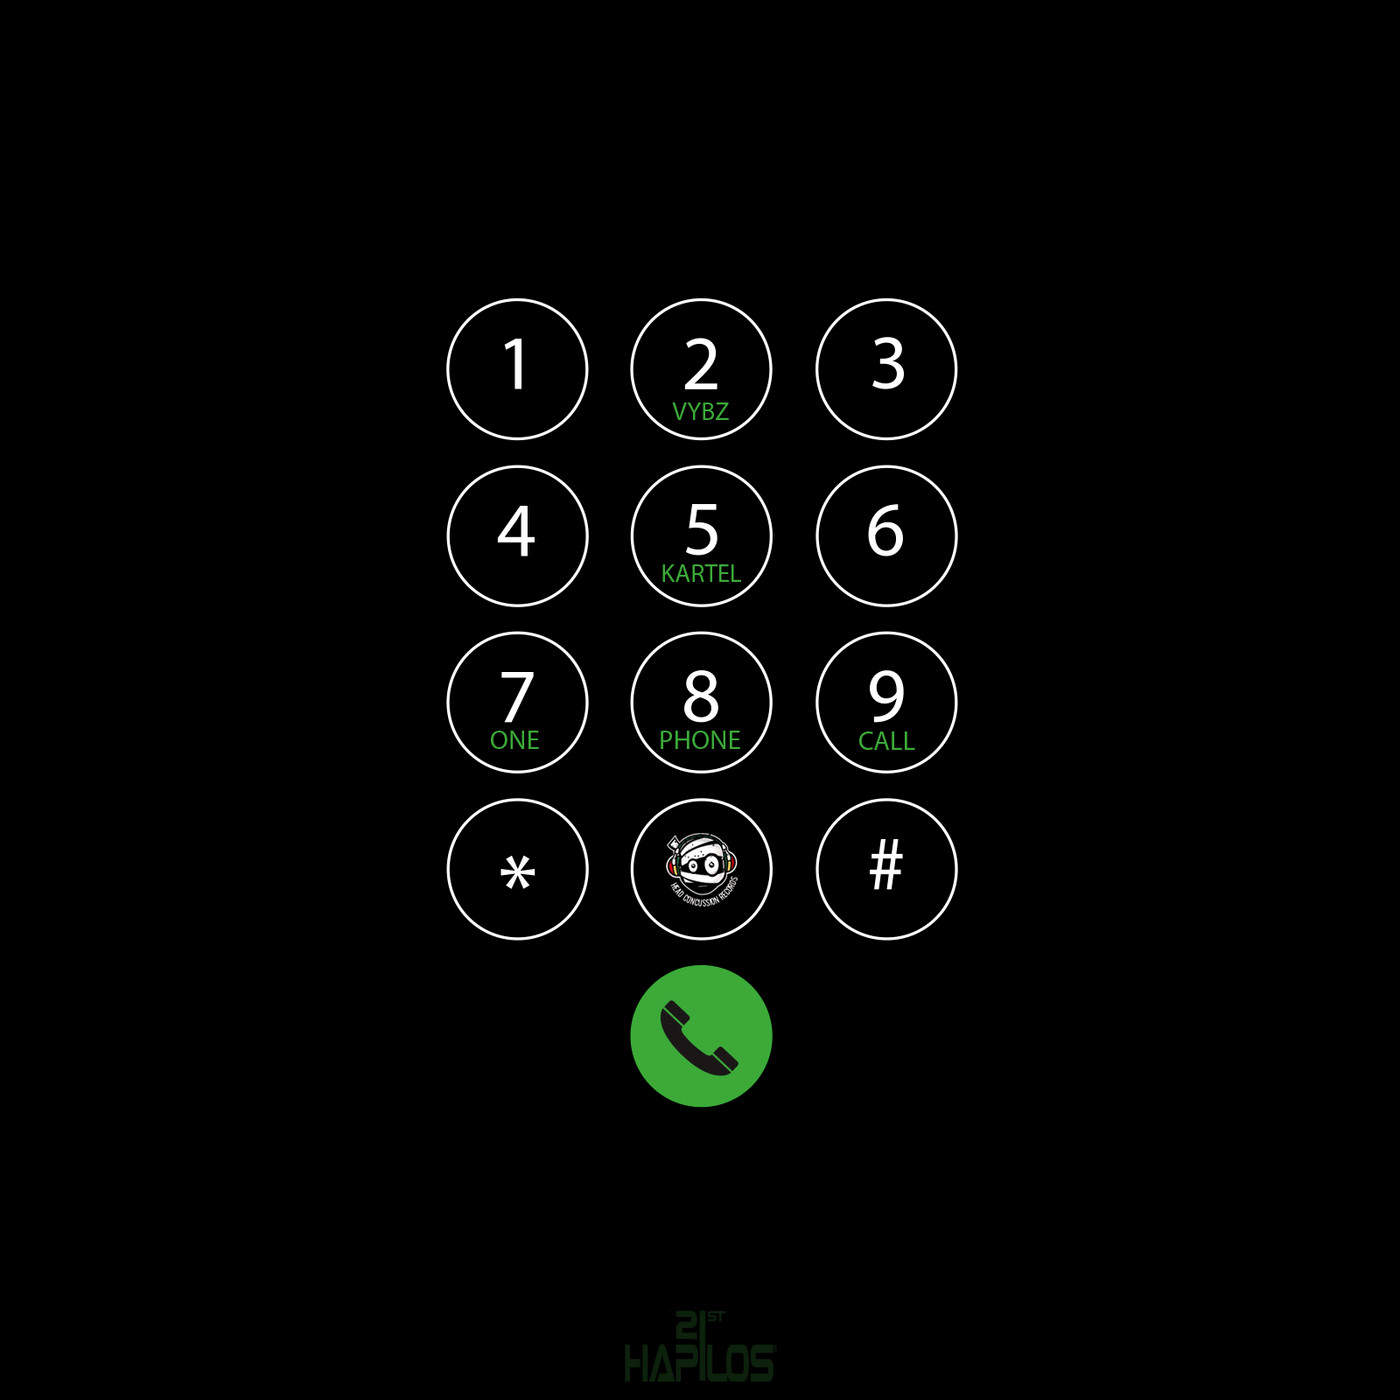 Vybz Kartel - One Phone Call - Single Cover